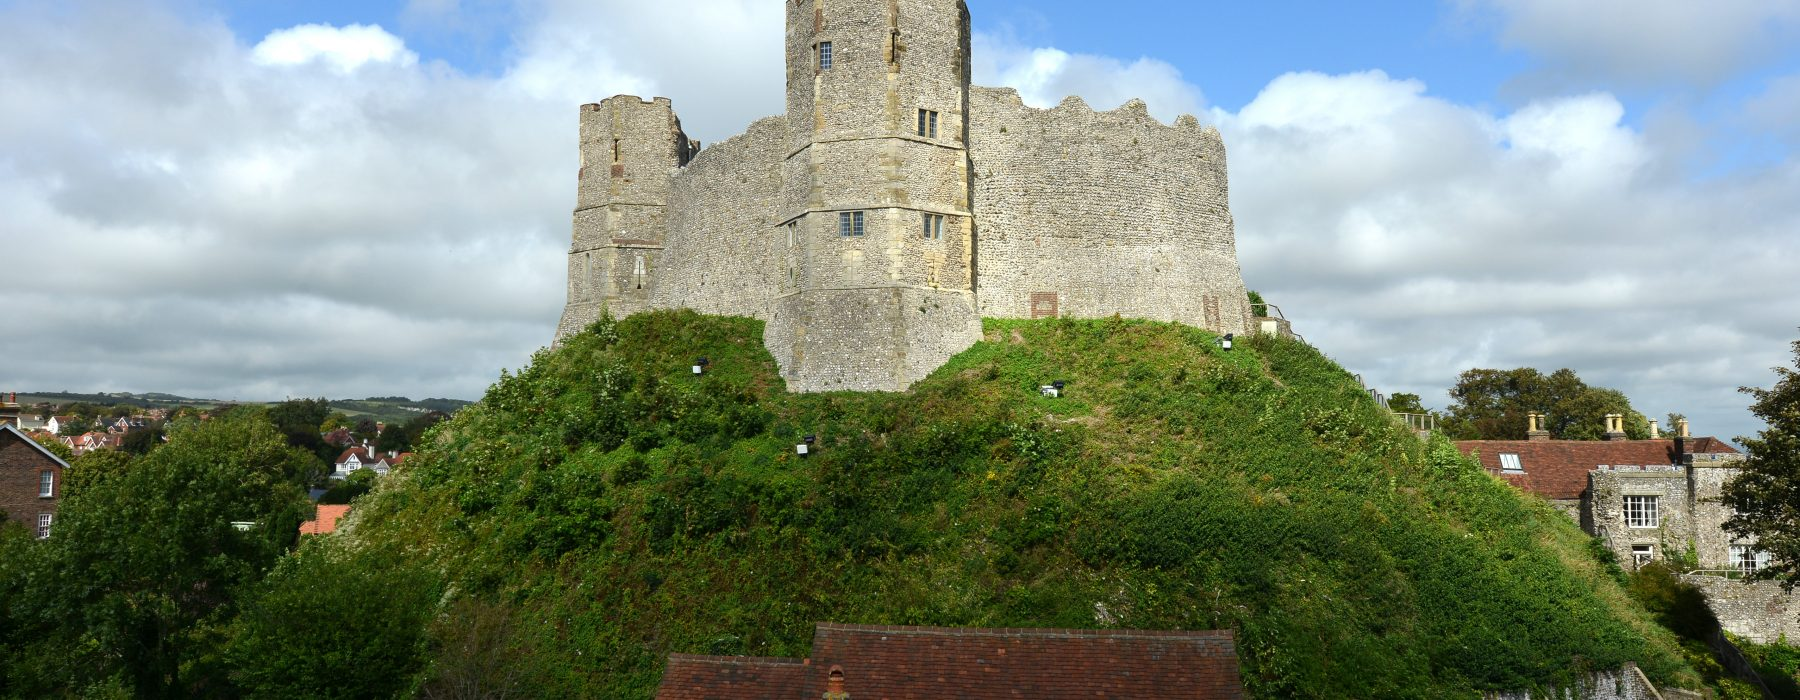 Norman castle at Lewes